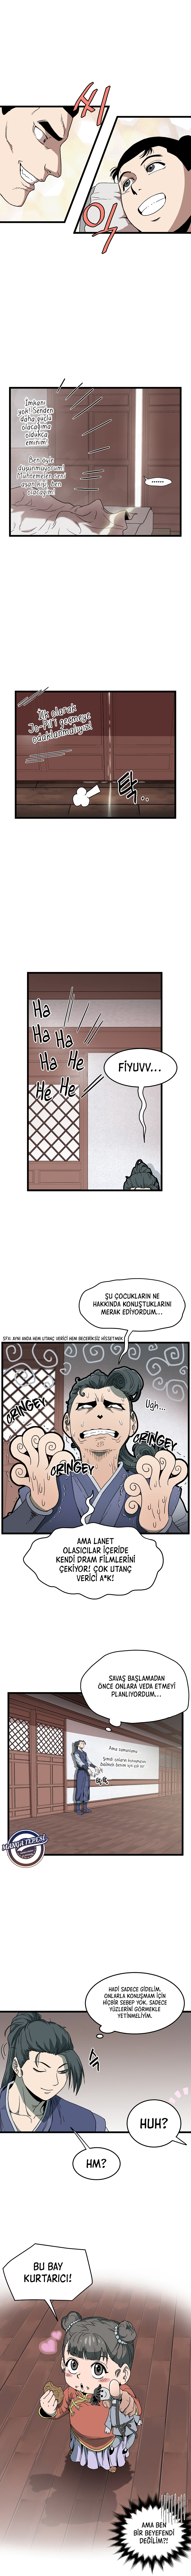 murim-loginbolum-33